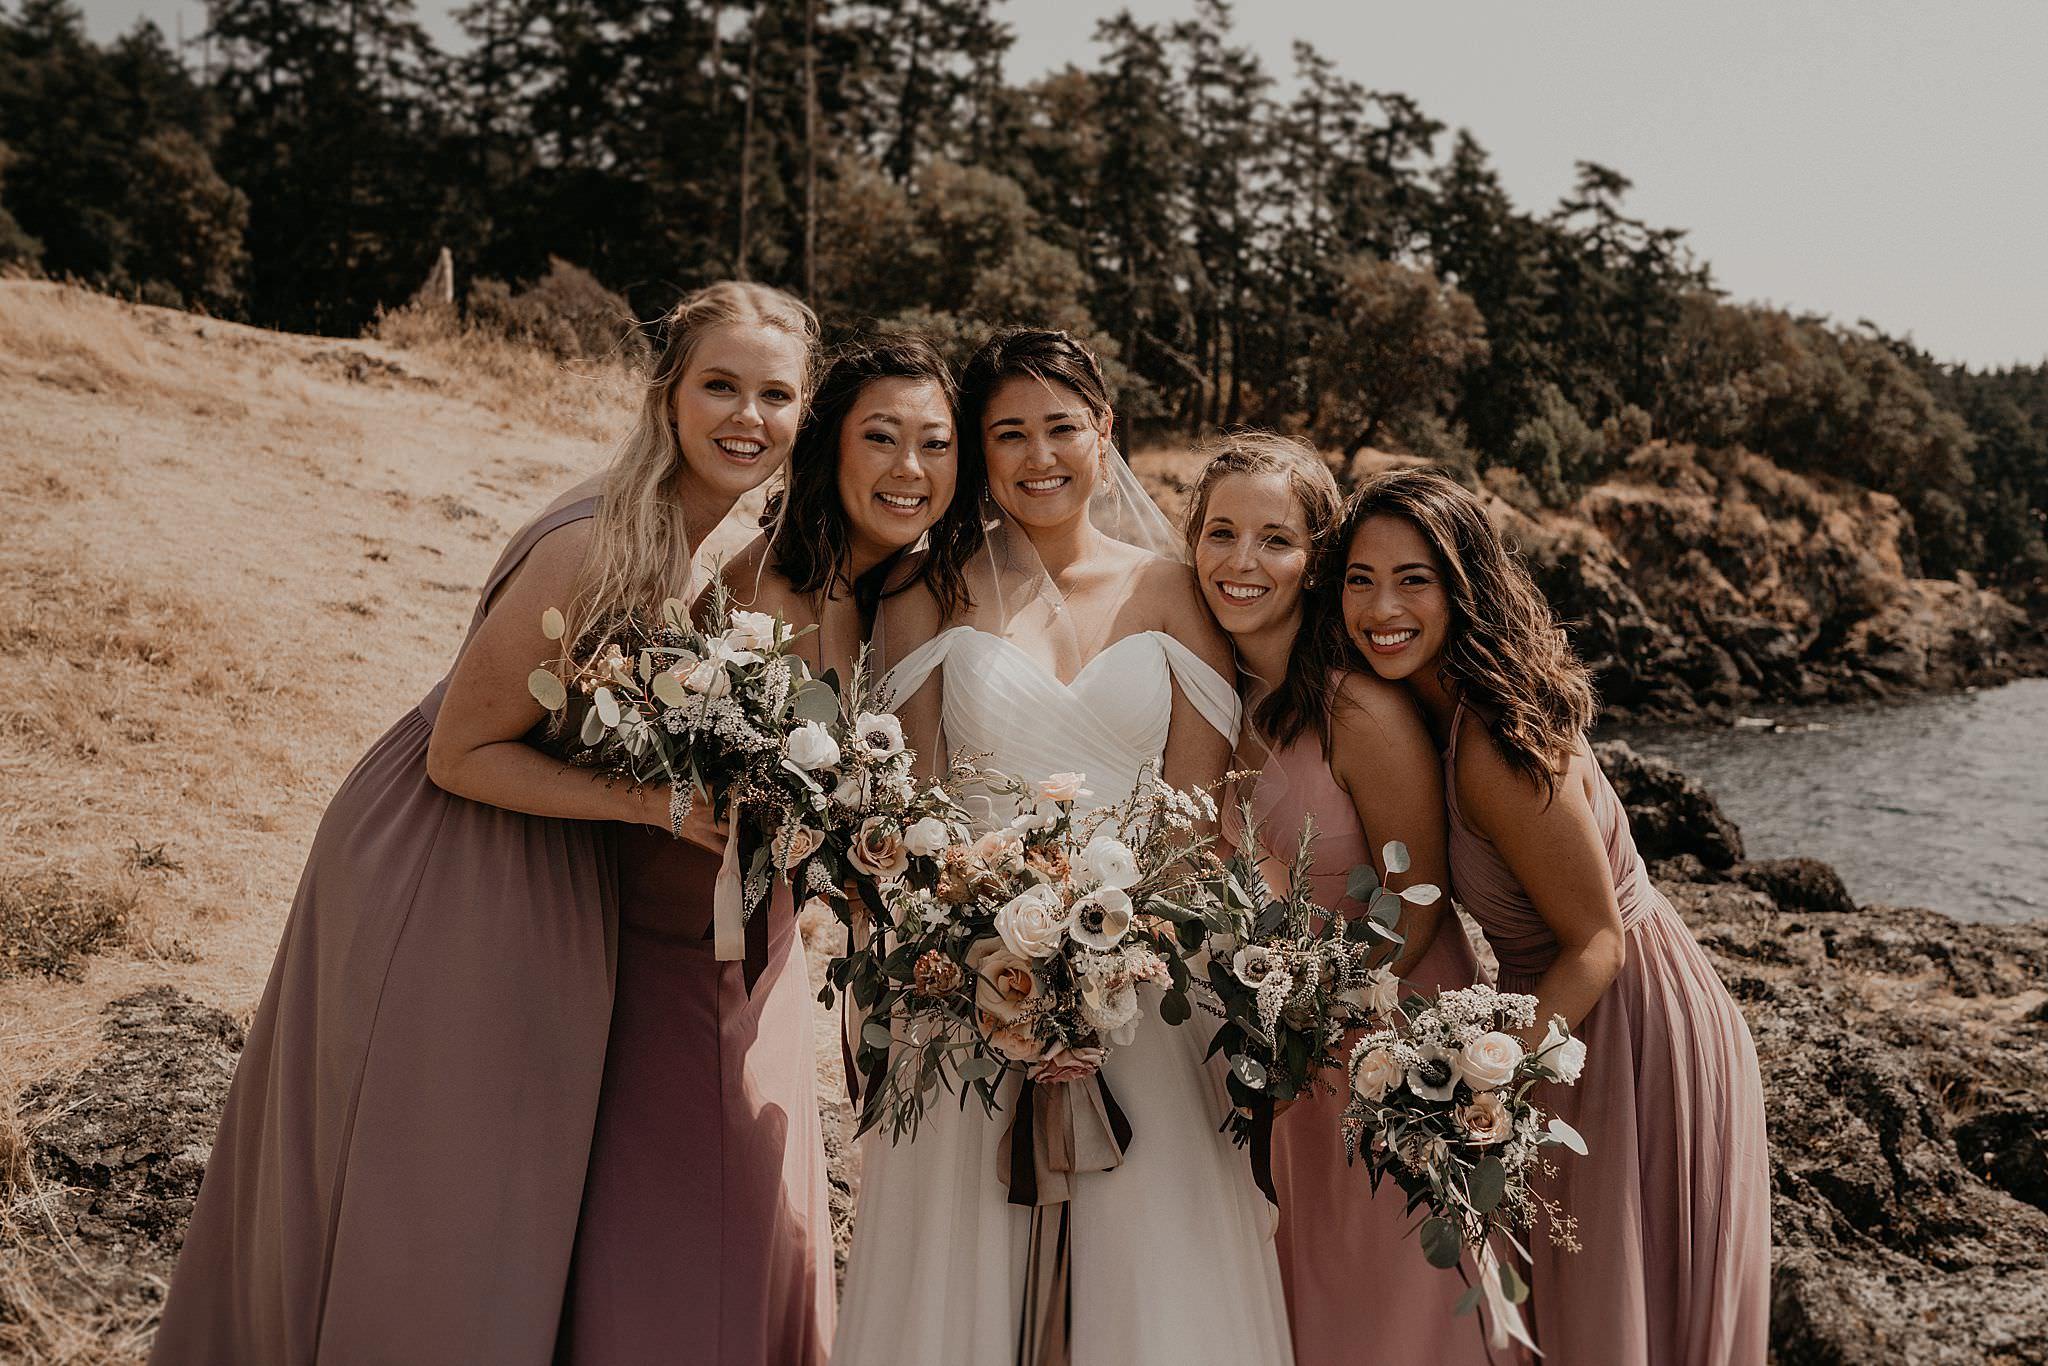 Roche Harbor Resort Wedding Bridal Party Formals Portraits Photos